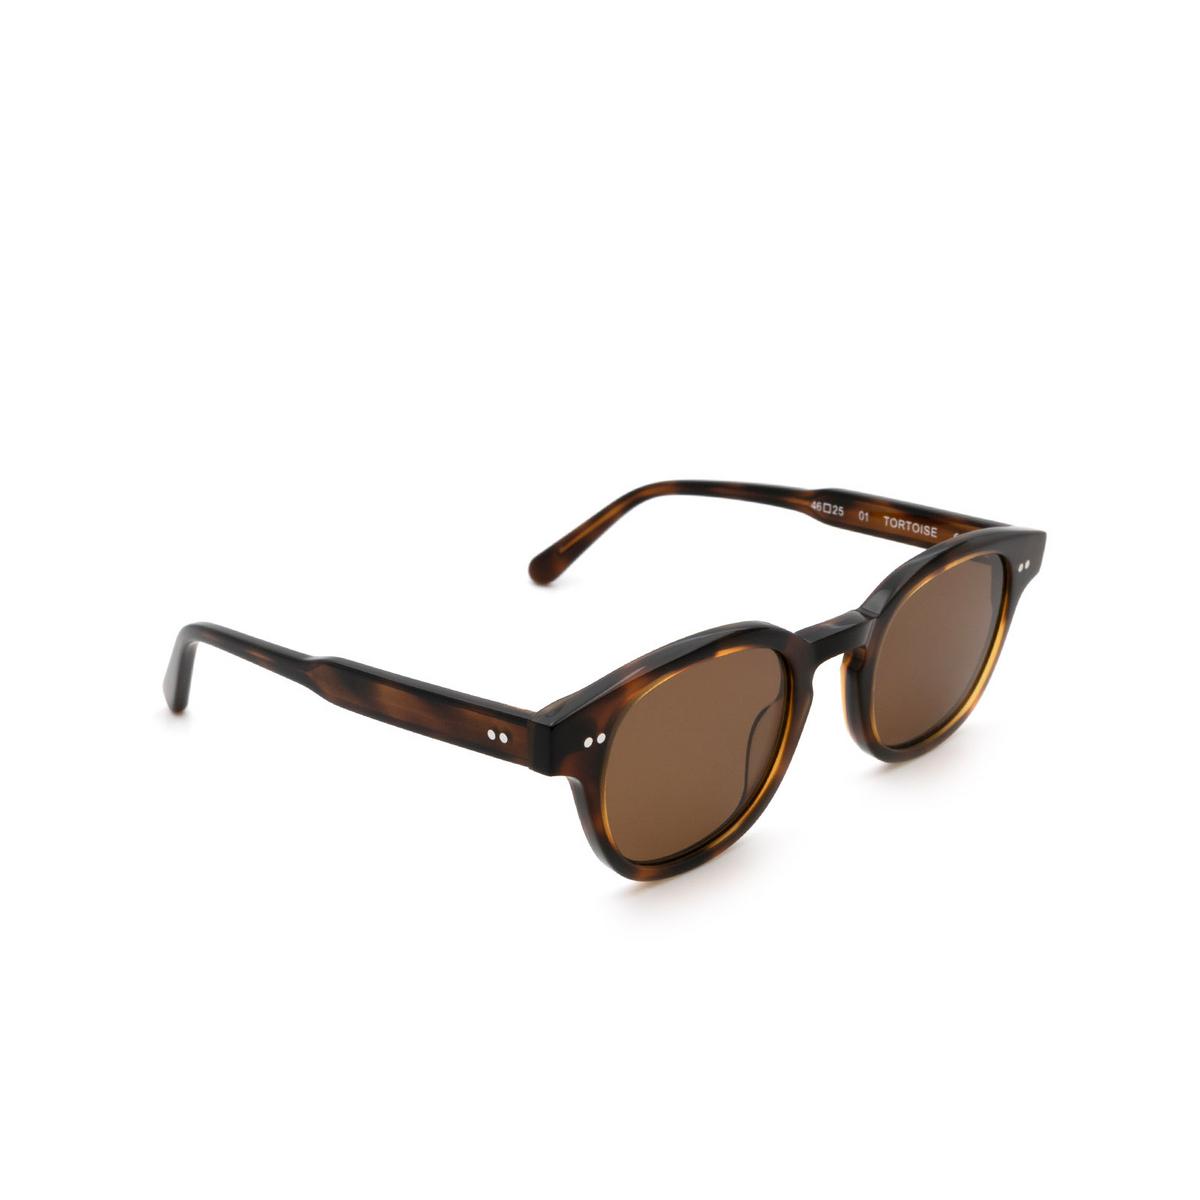 Chimi® Square Sunglasses: 01 color Tortoise - three-quarters view.